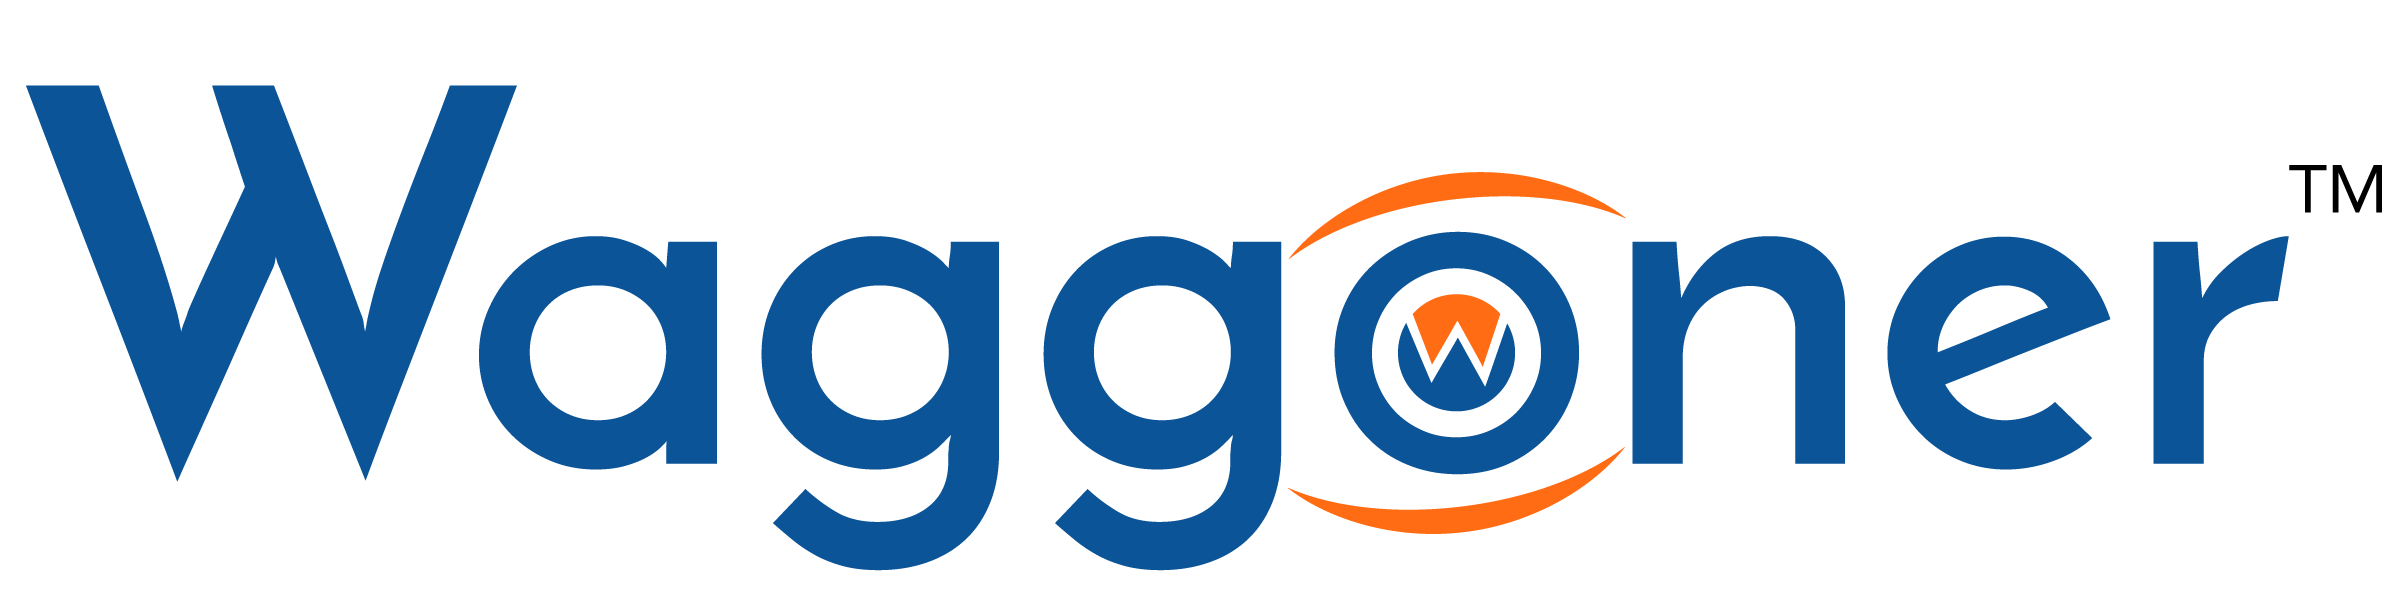 Waggoner Diagnostics logo